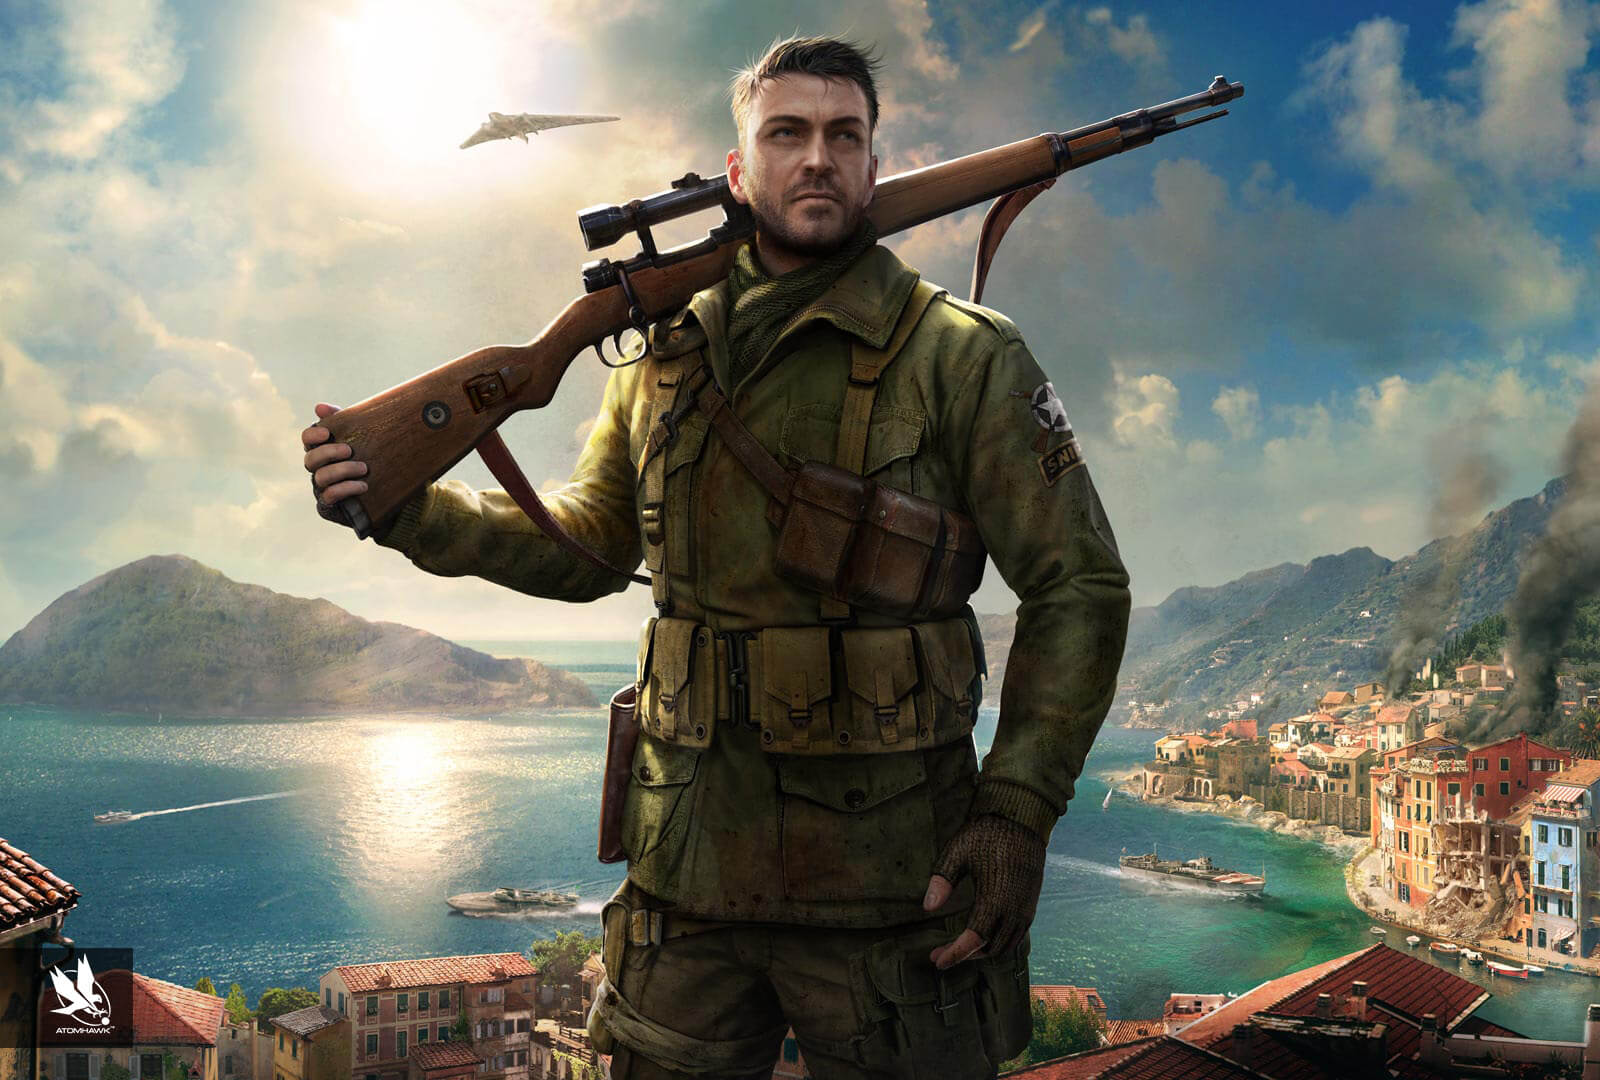 Atomhawk_Rebellion_Sniper-Elite-4_Marketing-Art_Key-Art.jpg